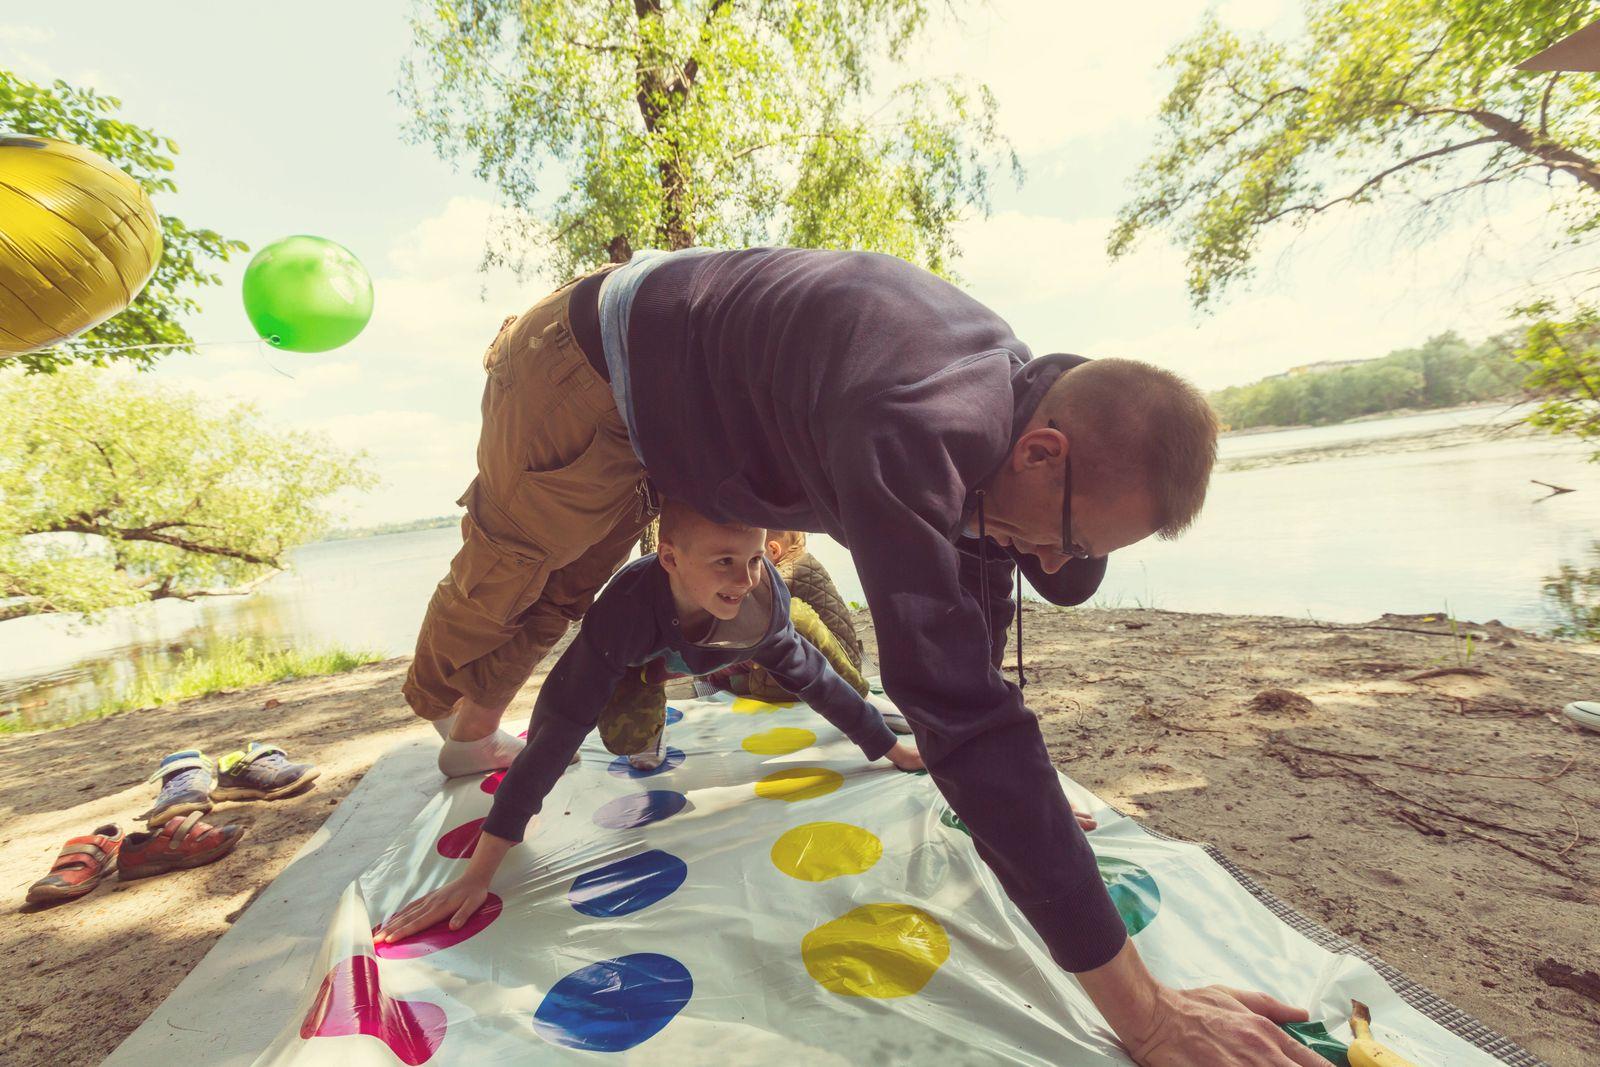 Kids playing twister game outdoors,model released, Symbolfoto PUBLICATIONxINxGERxSUIxAUTxONLY ING_19071_17348